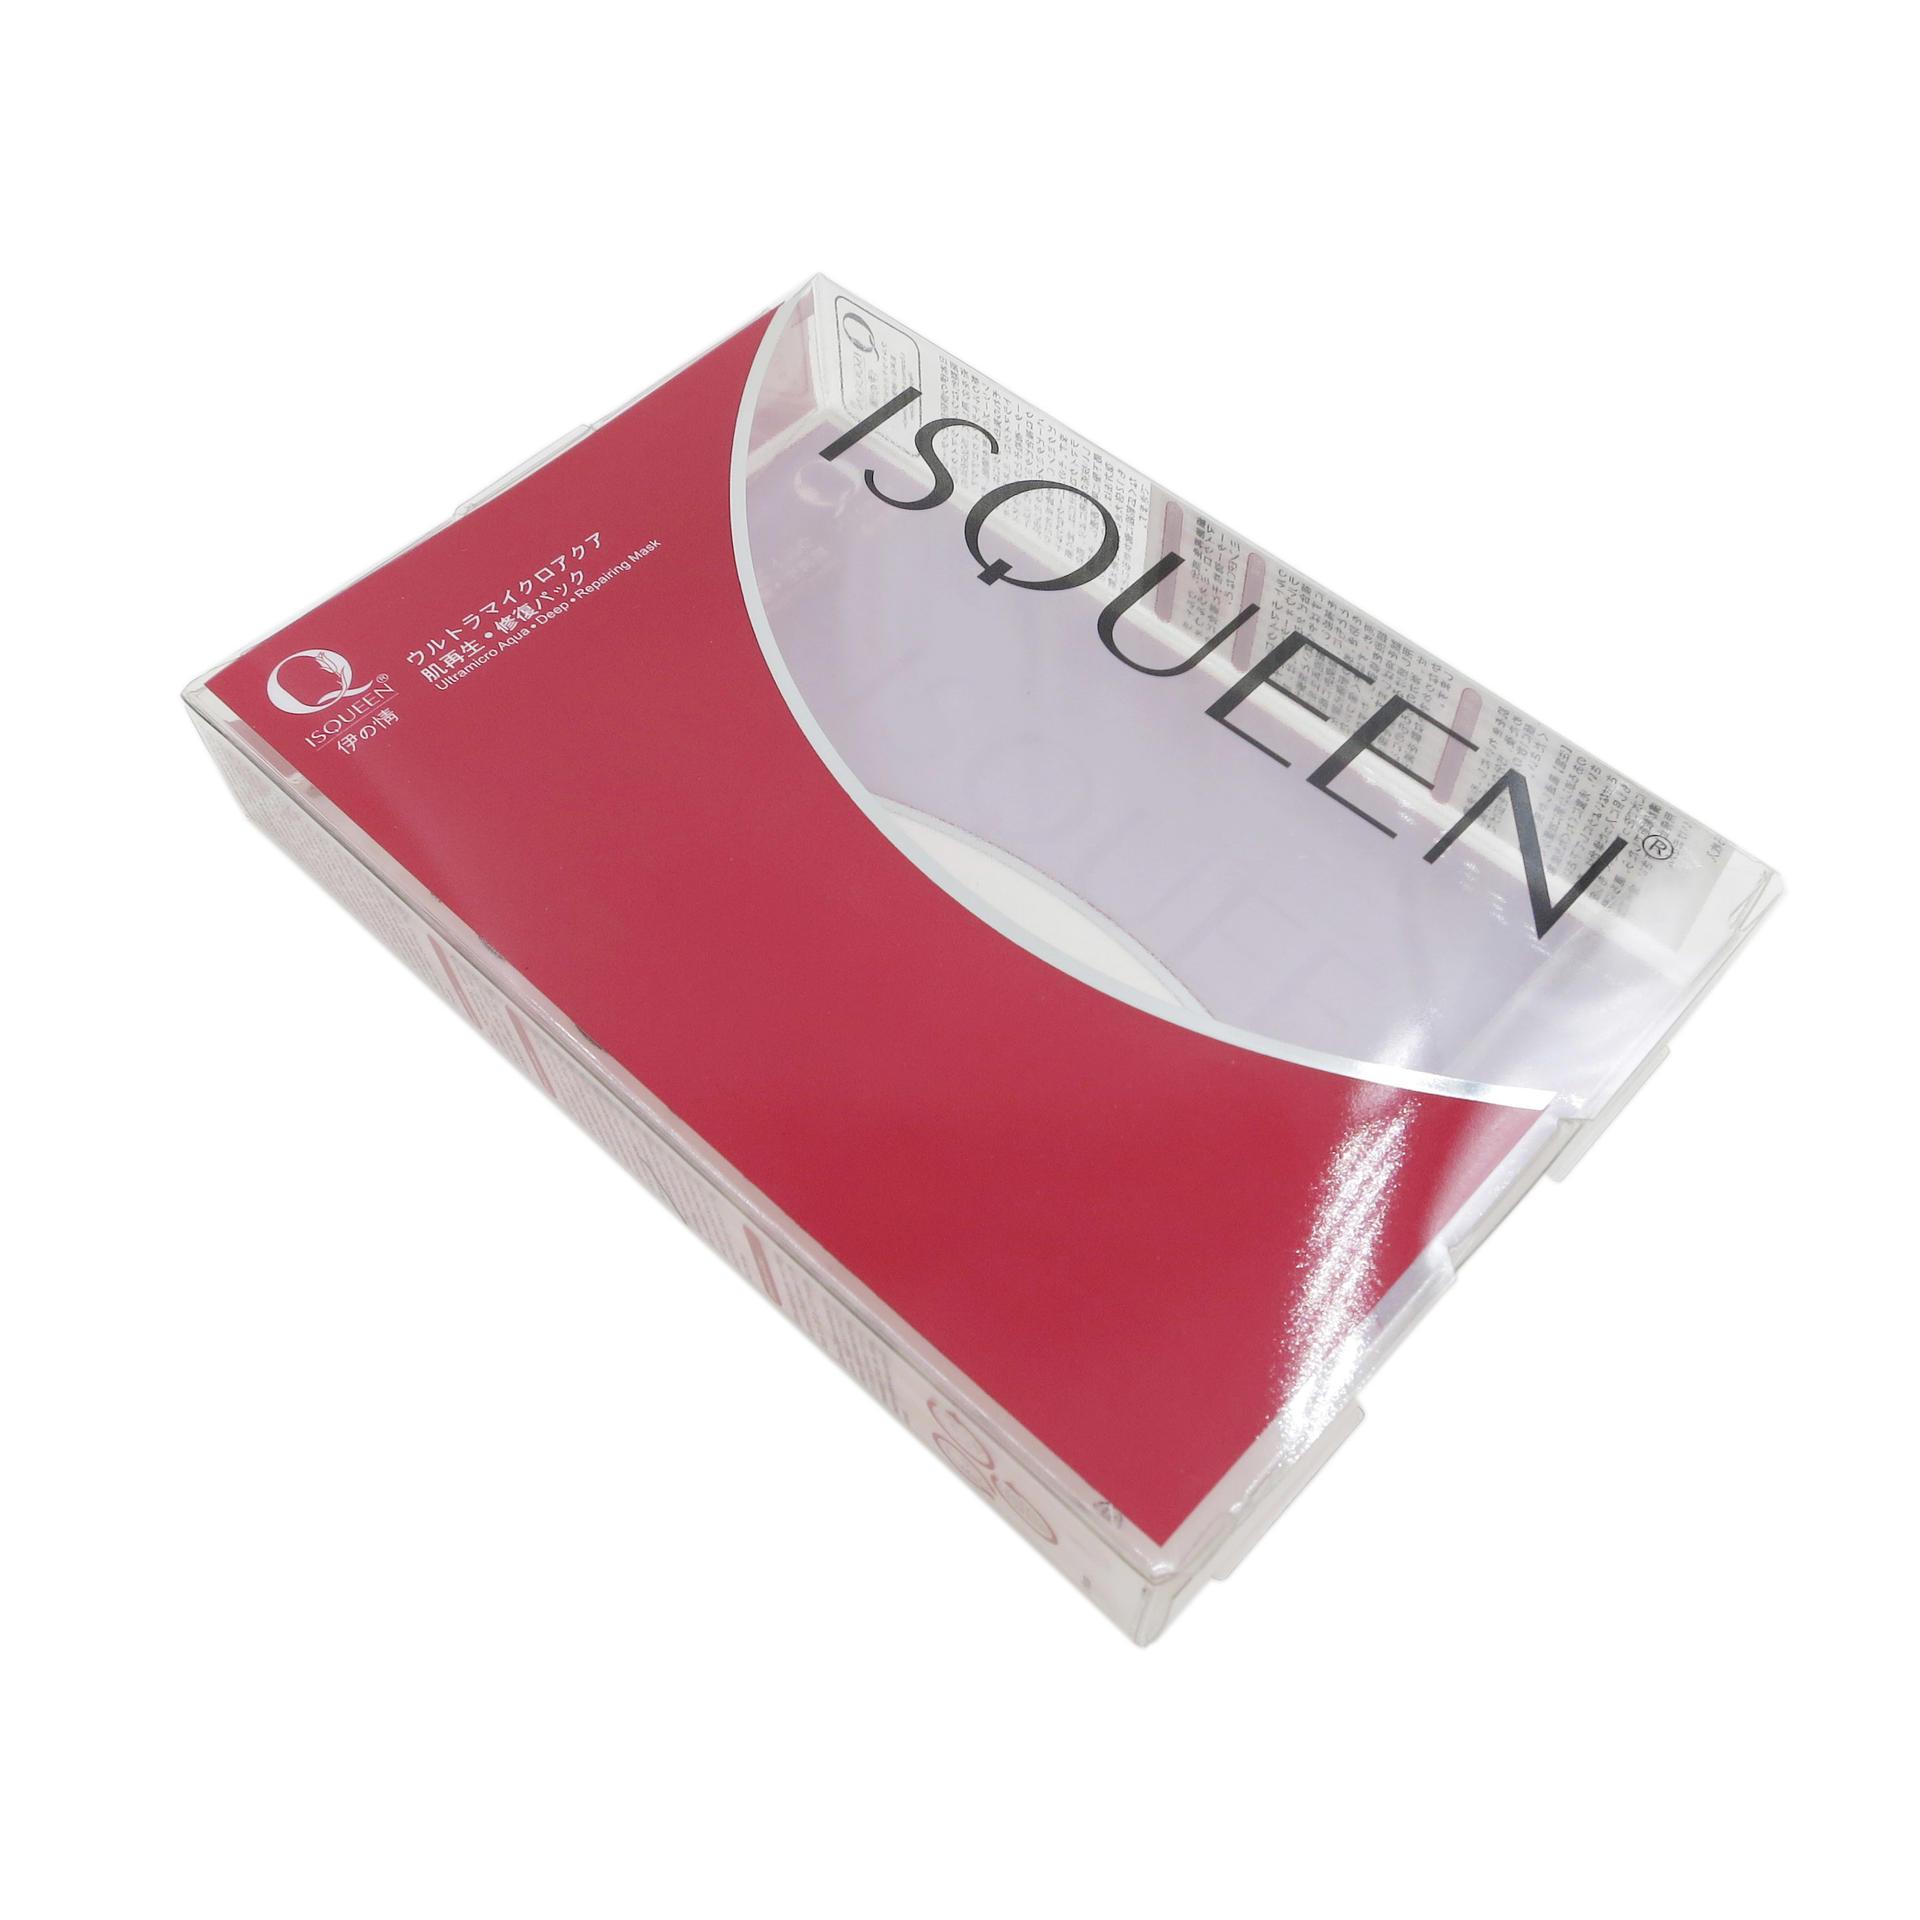 Custom PET Soft Crease Plastic Packaging Box for Sheet Mask